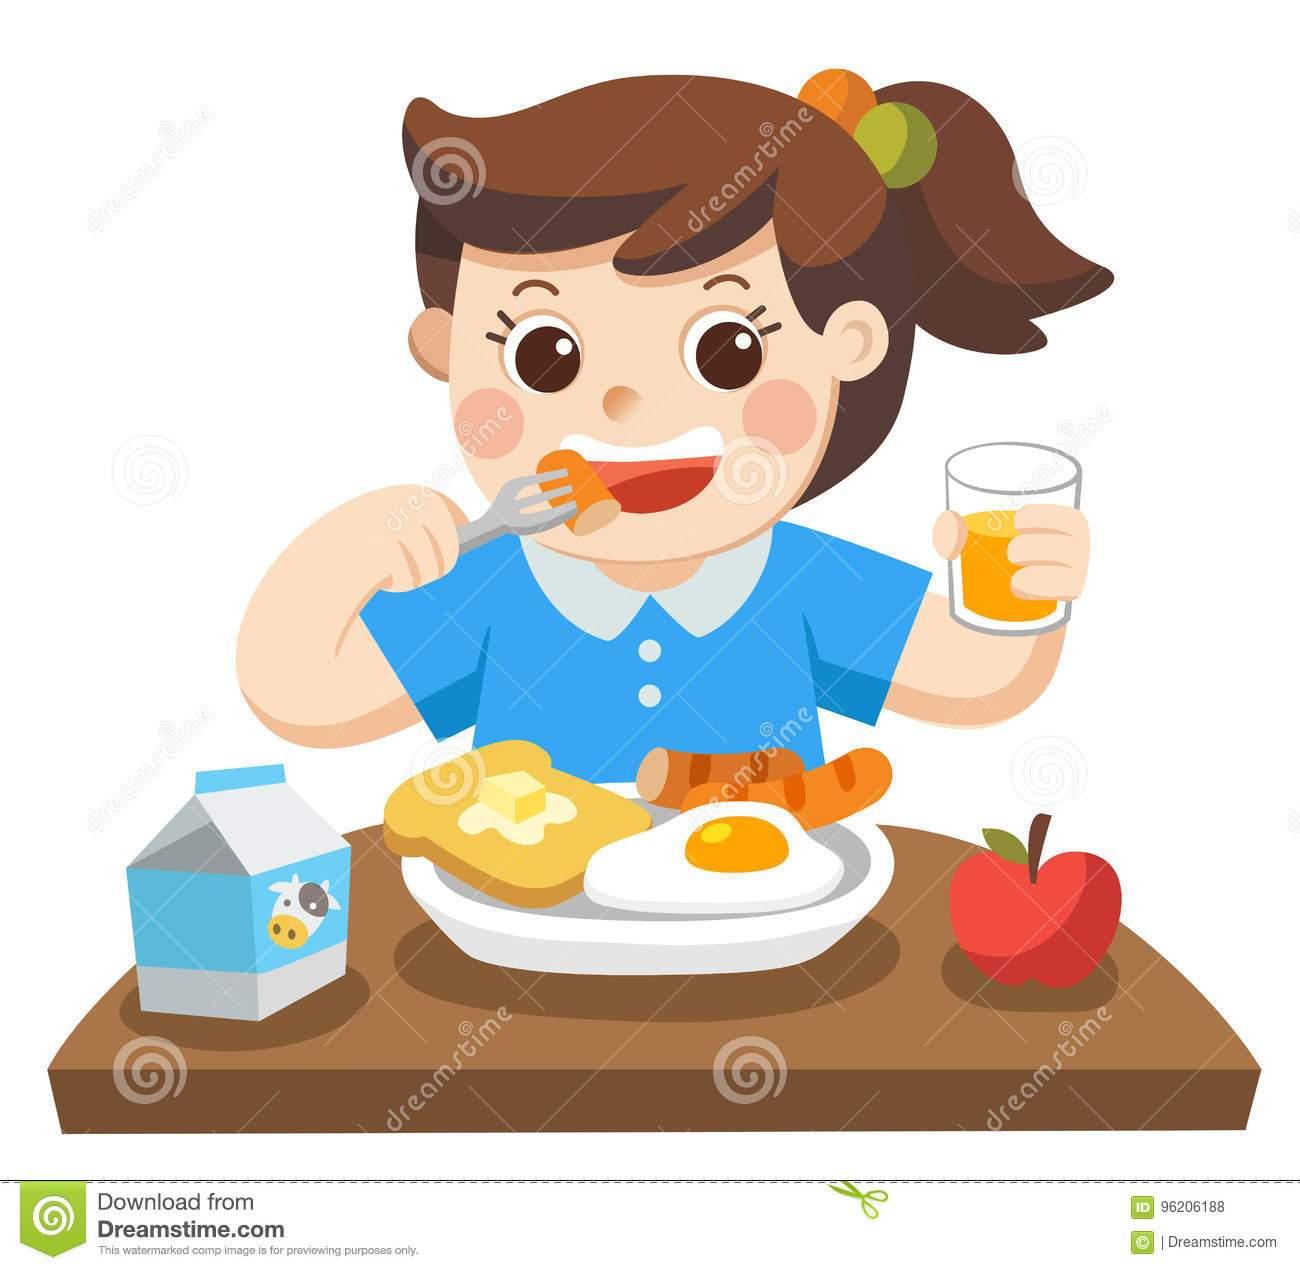 Eat breakfast clipart girl 3 » Clipart Portal.